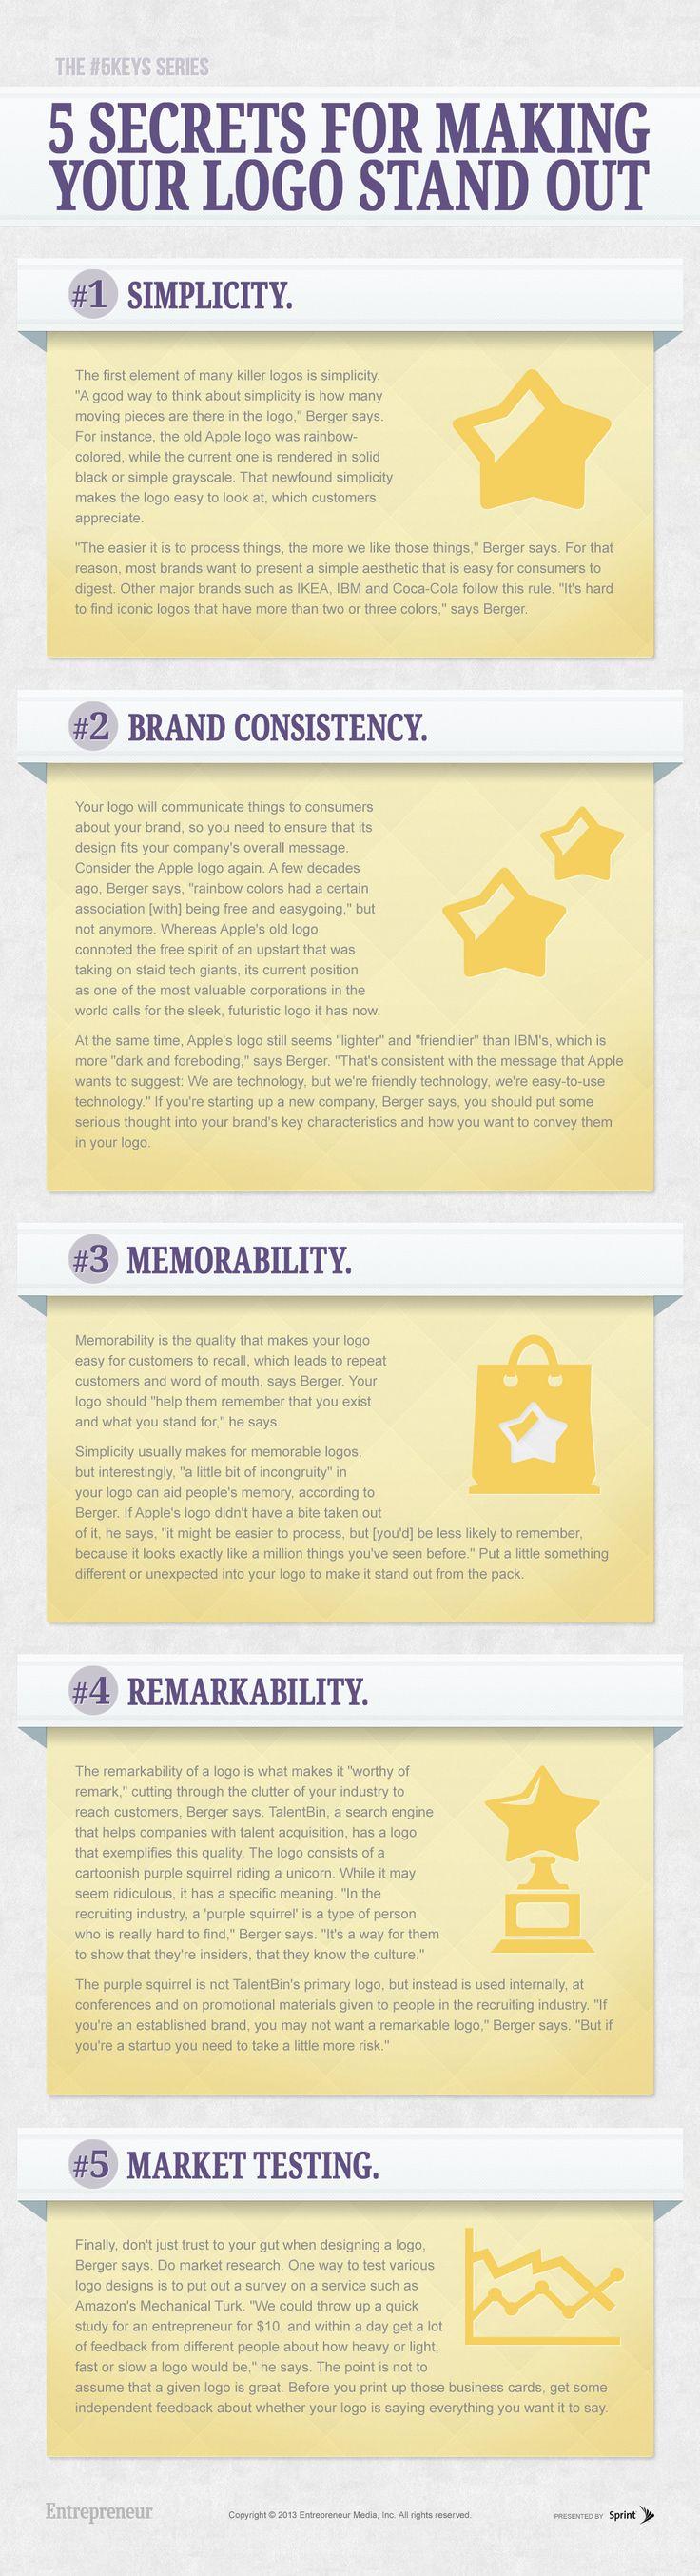 5 Secrets for Making Your Logo Stand Out  www.digitalinformationworld.com